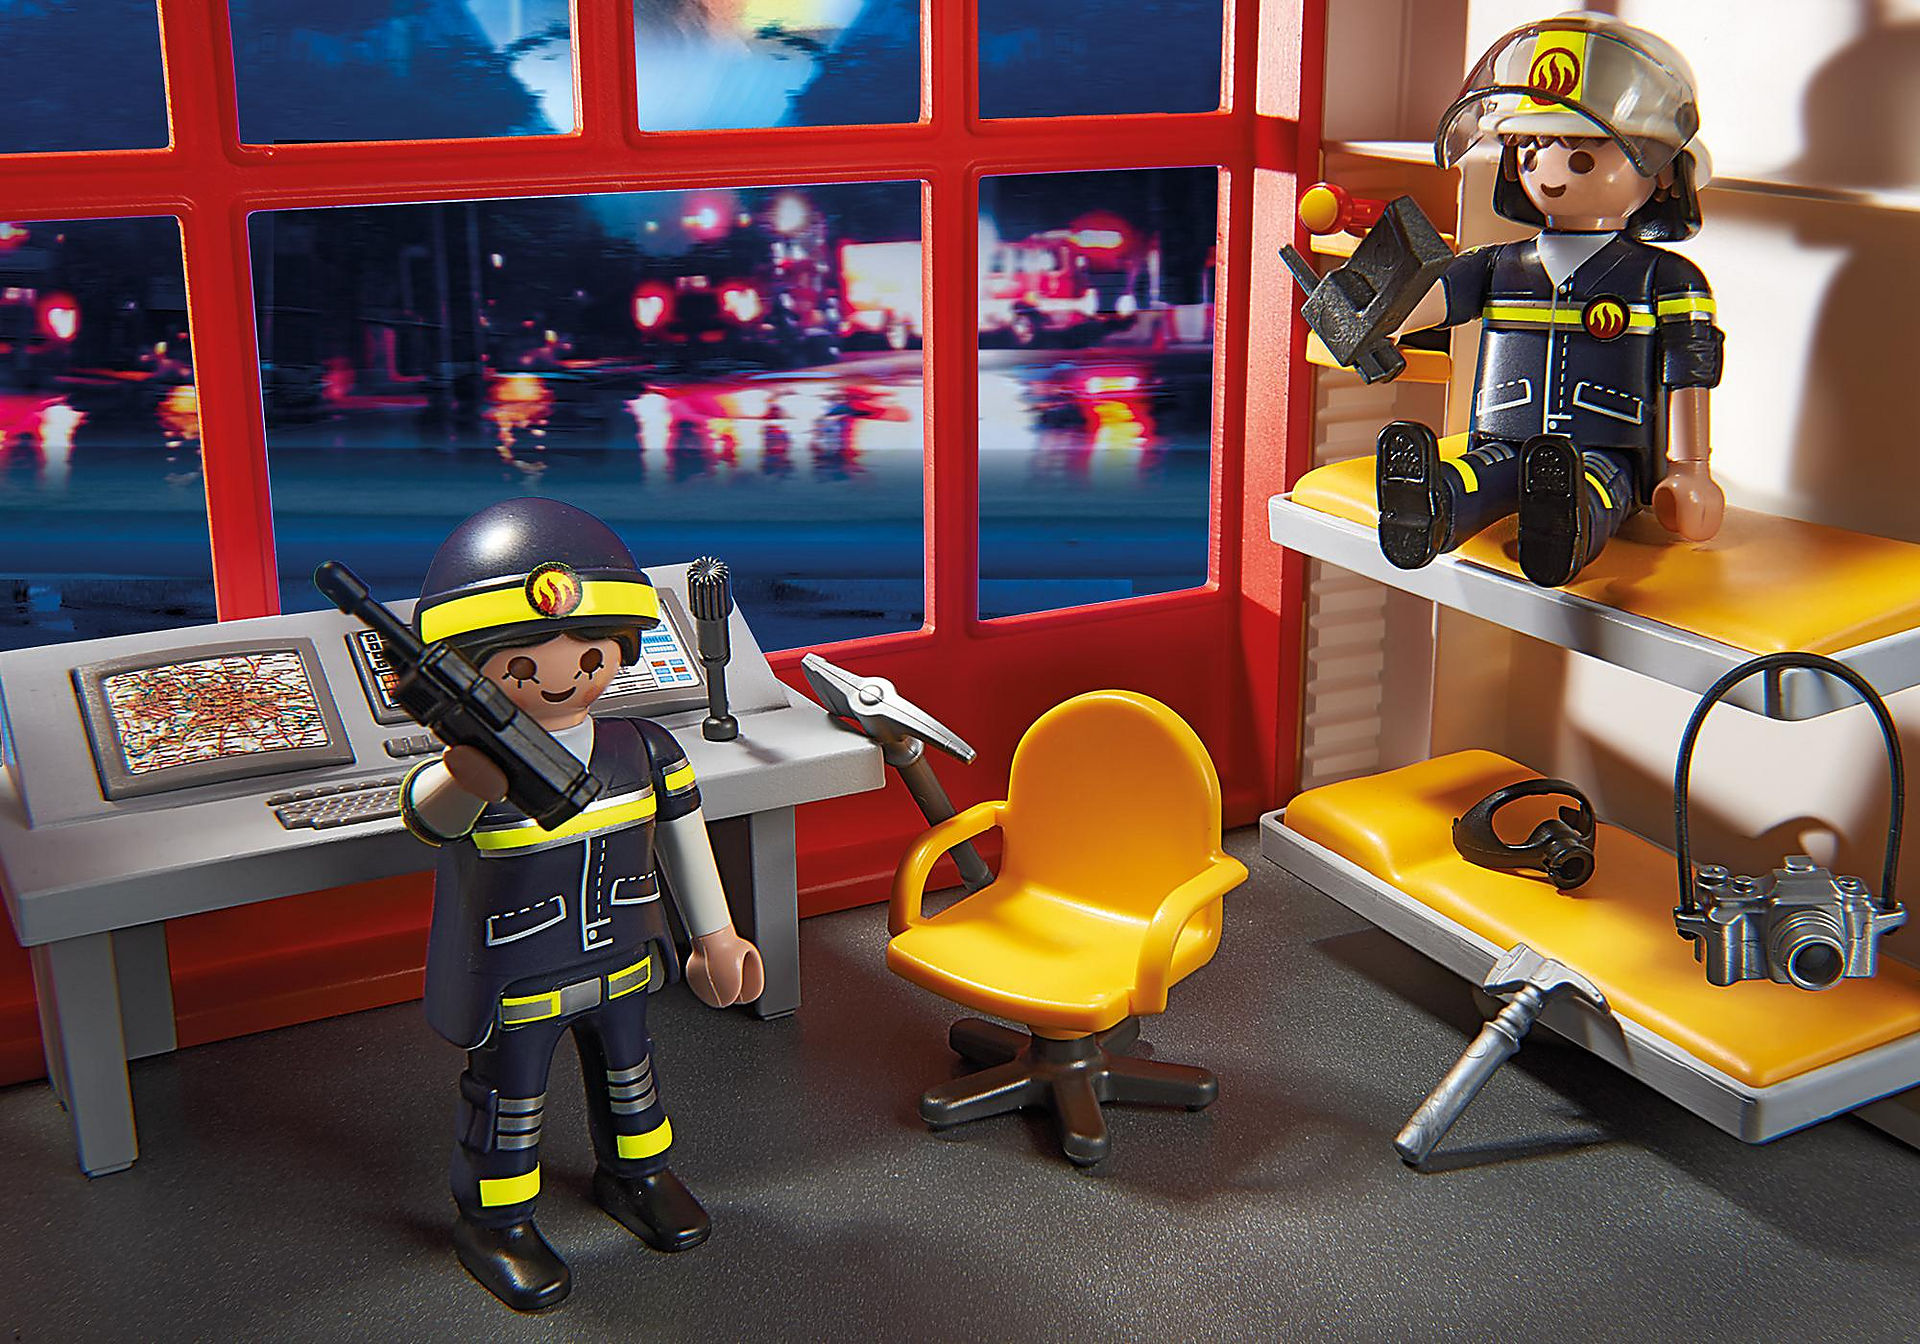 http://media.playmobil.com/i/playmobil/5361_product_extra2/Estación de Bomberos con Alarma